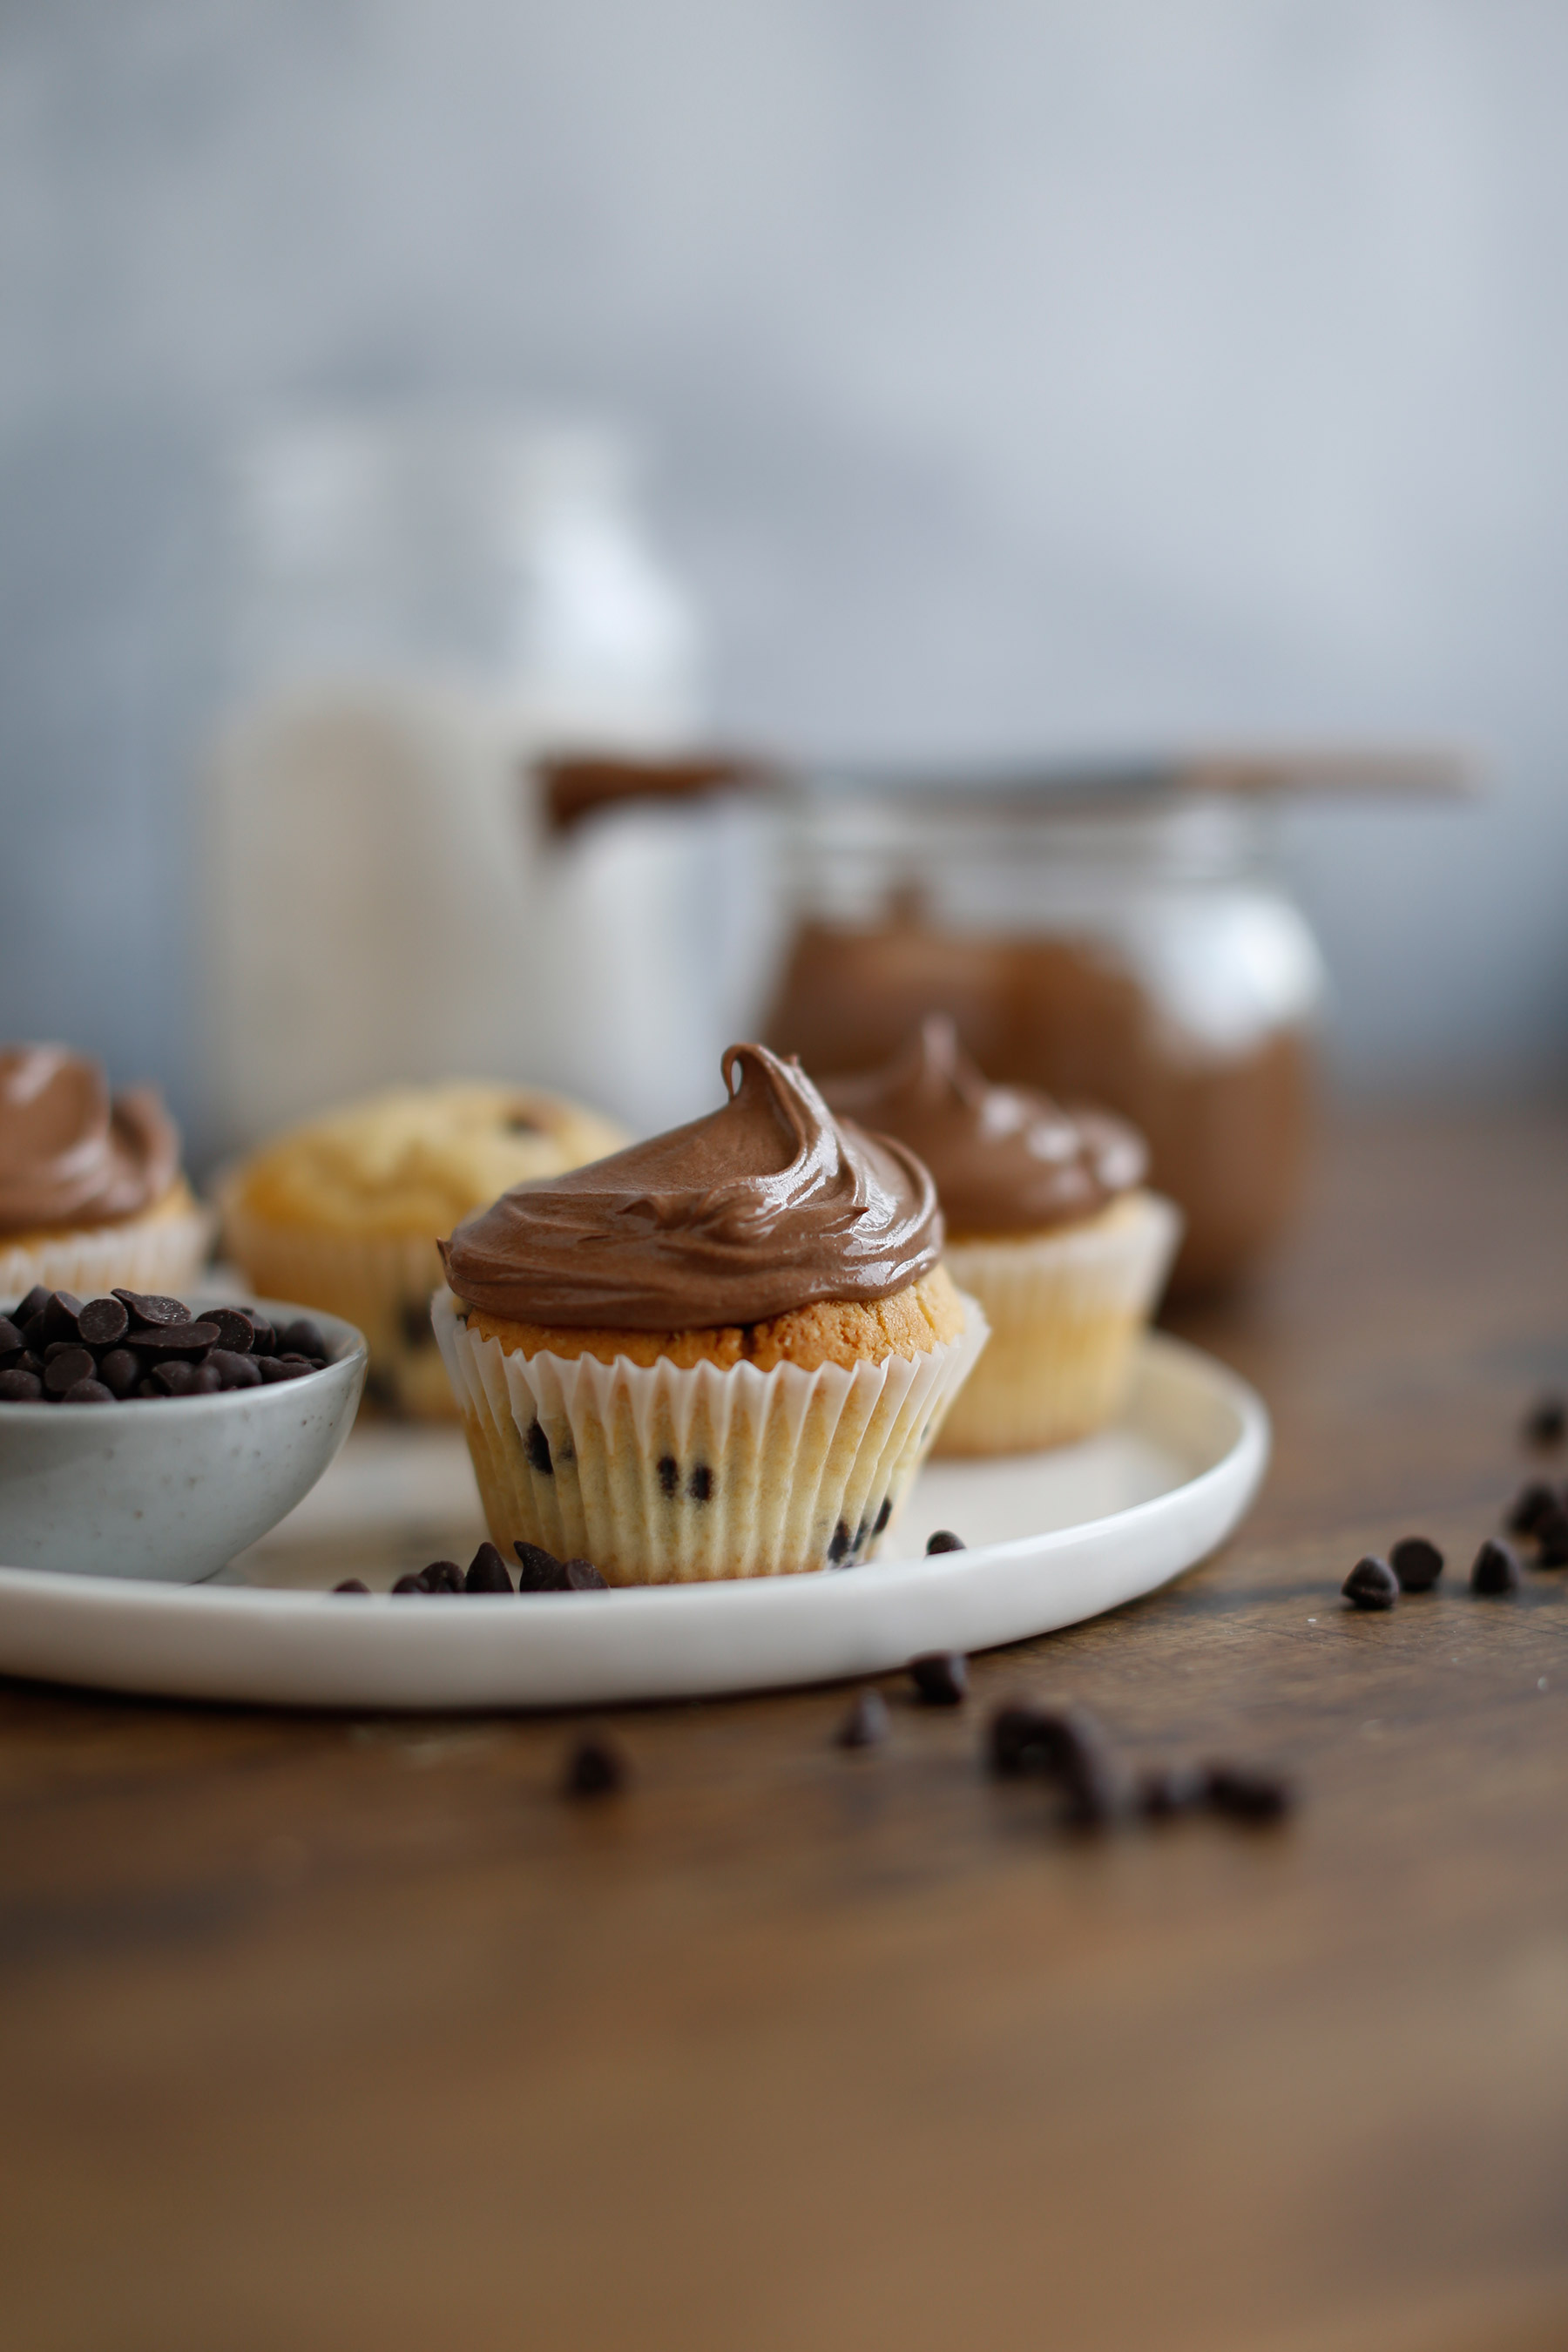 Dark-Chocolate-and-Vanilla-Cupcakes-with-Milk-Chocolate-Icing-1